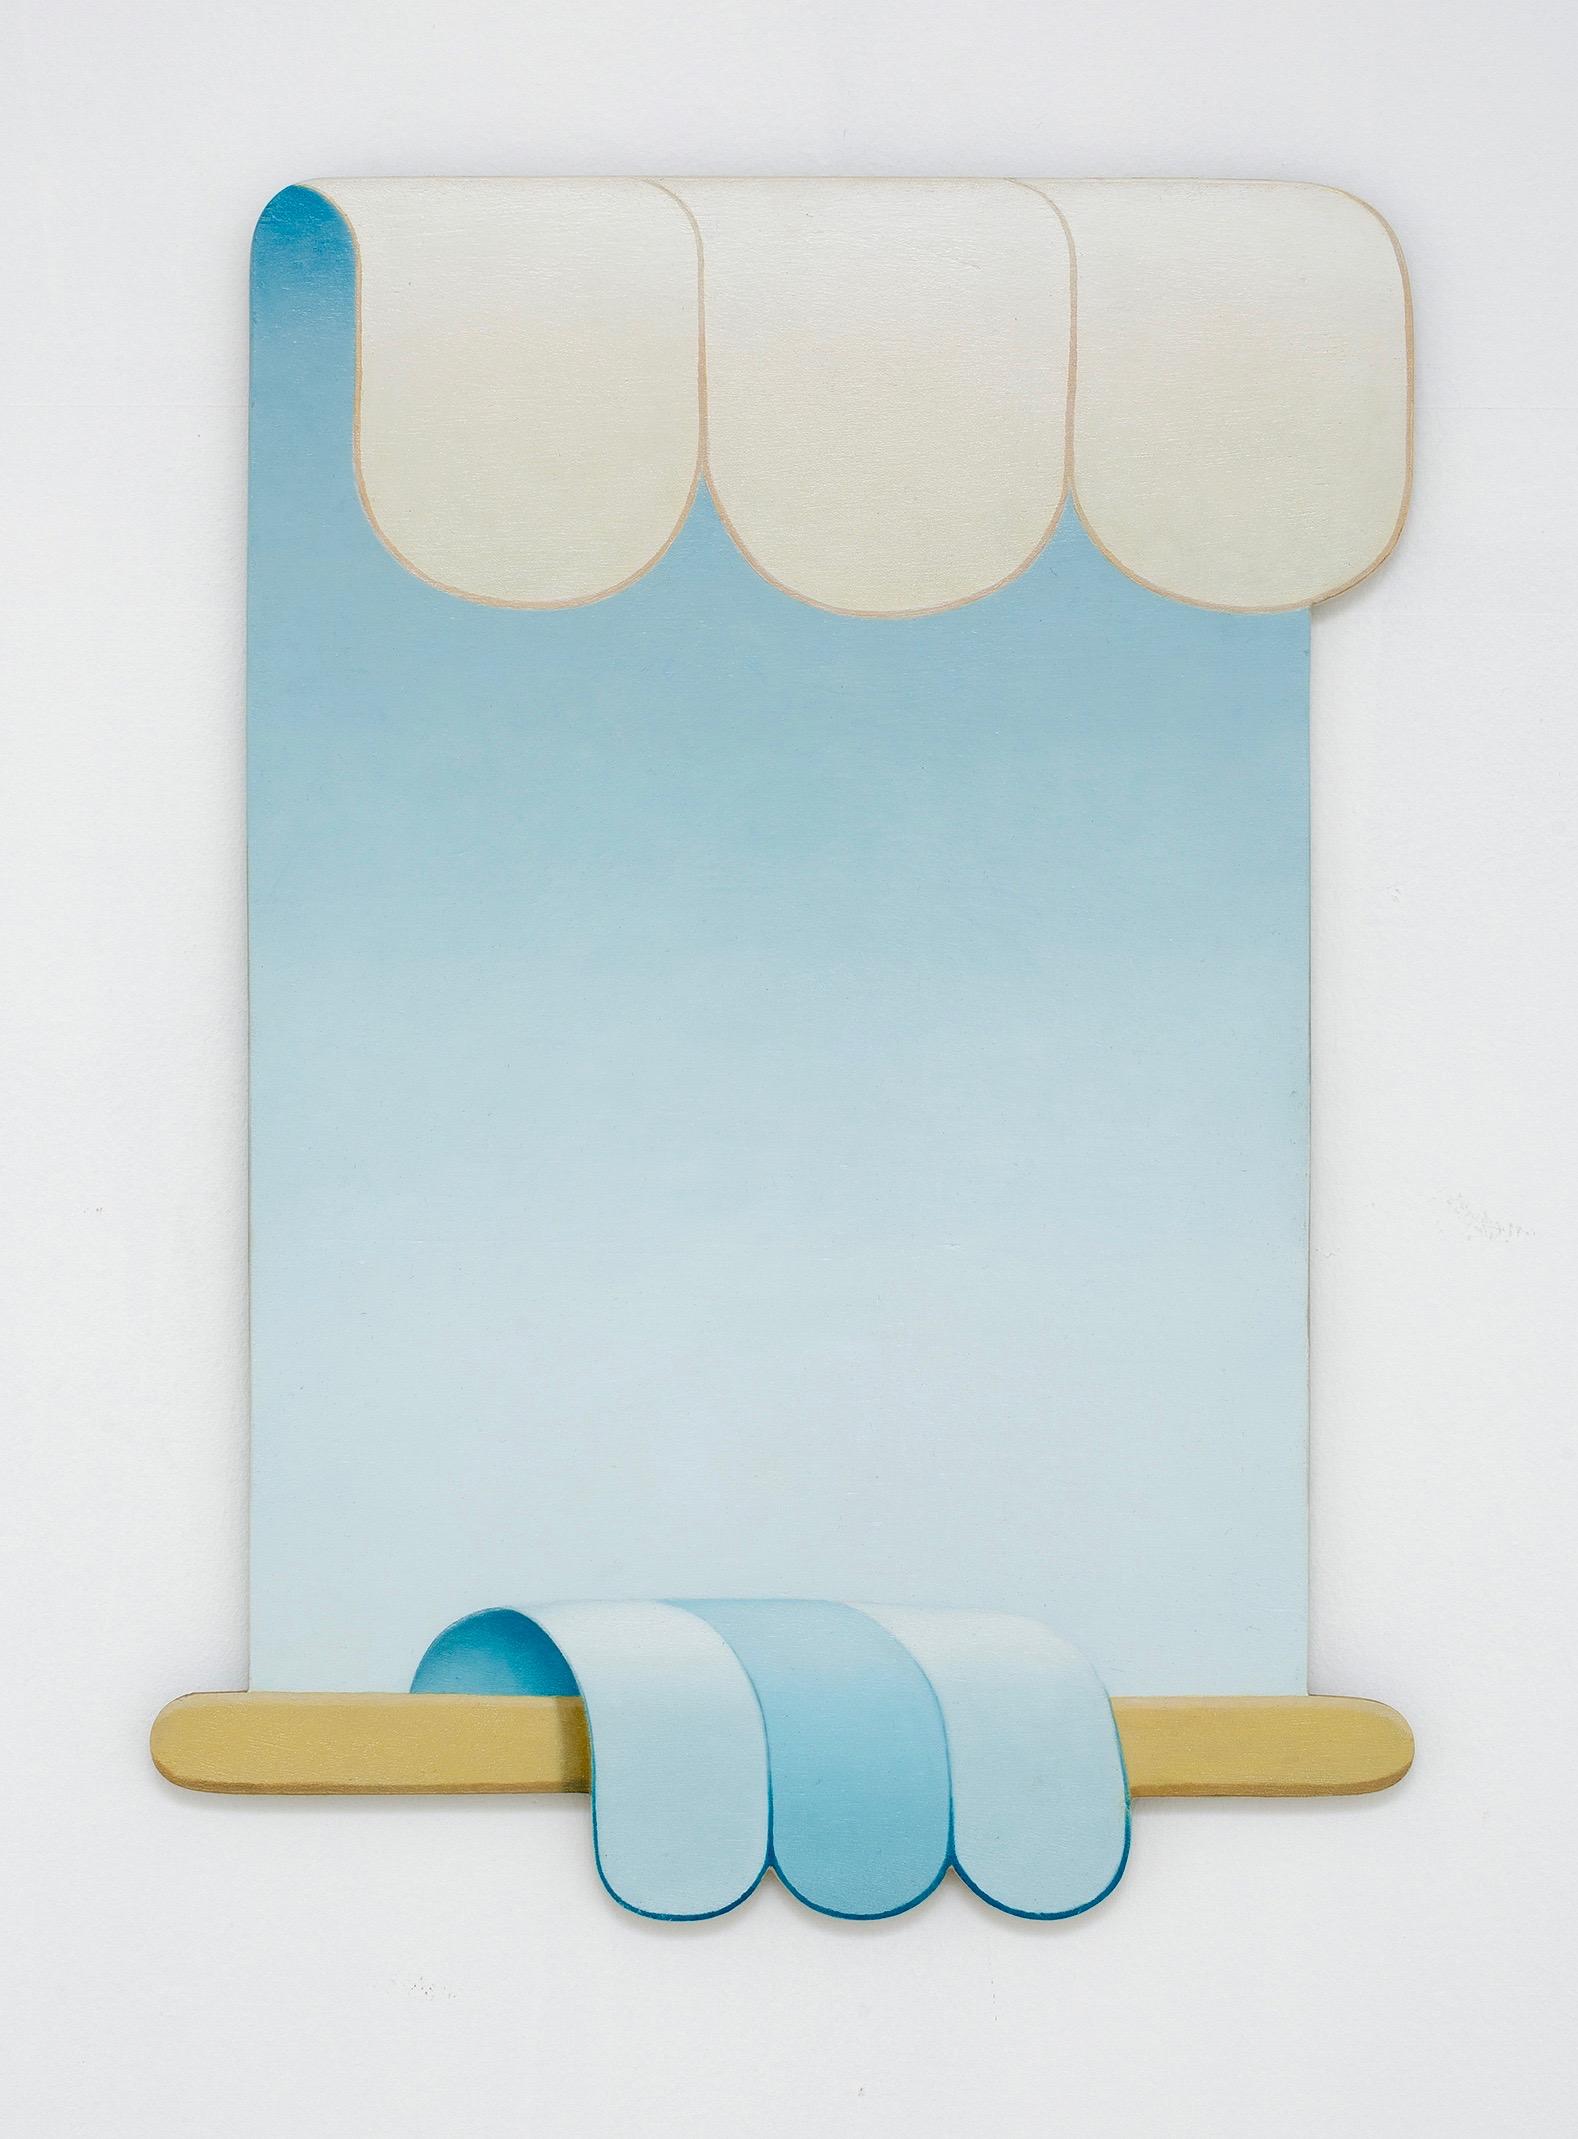 ADRIAN HOBBS Good Ancestor 2018 oil on hand-shaped ply 59.5 × 43 cm